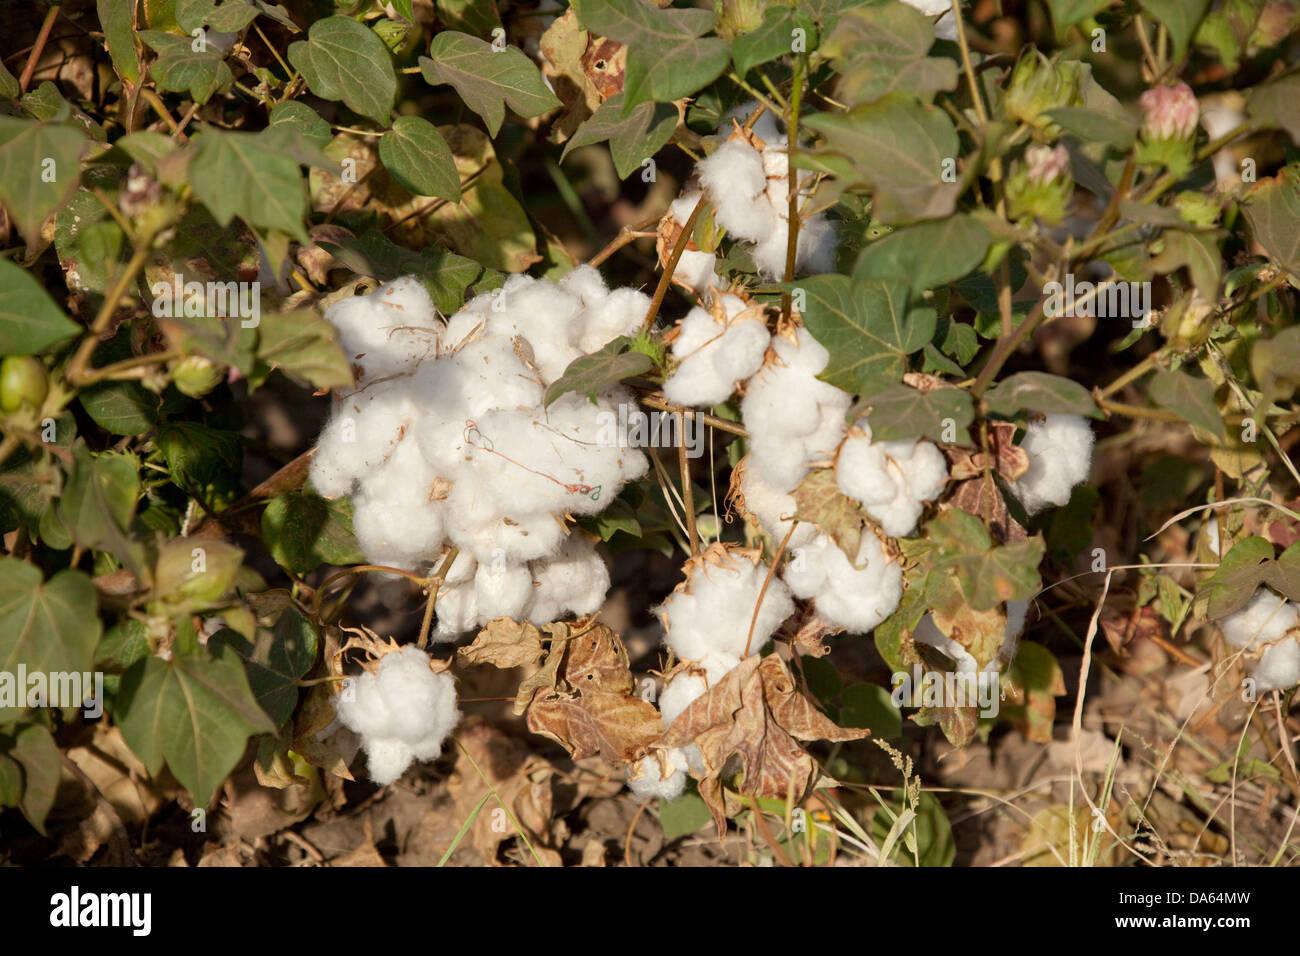 Cotton, harvest, crop, Africa, agriculture, Ethiopia, - Stock Image